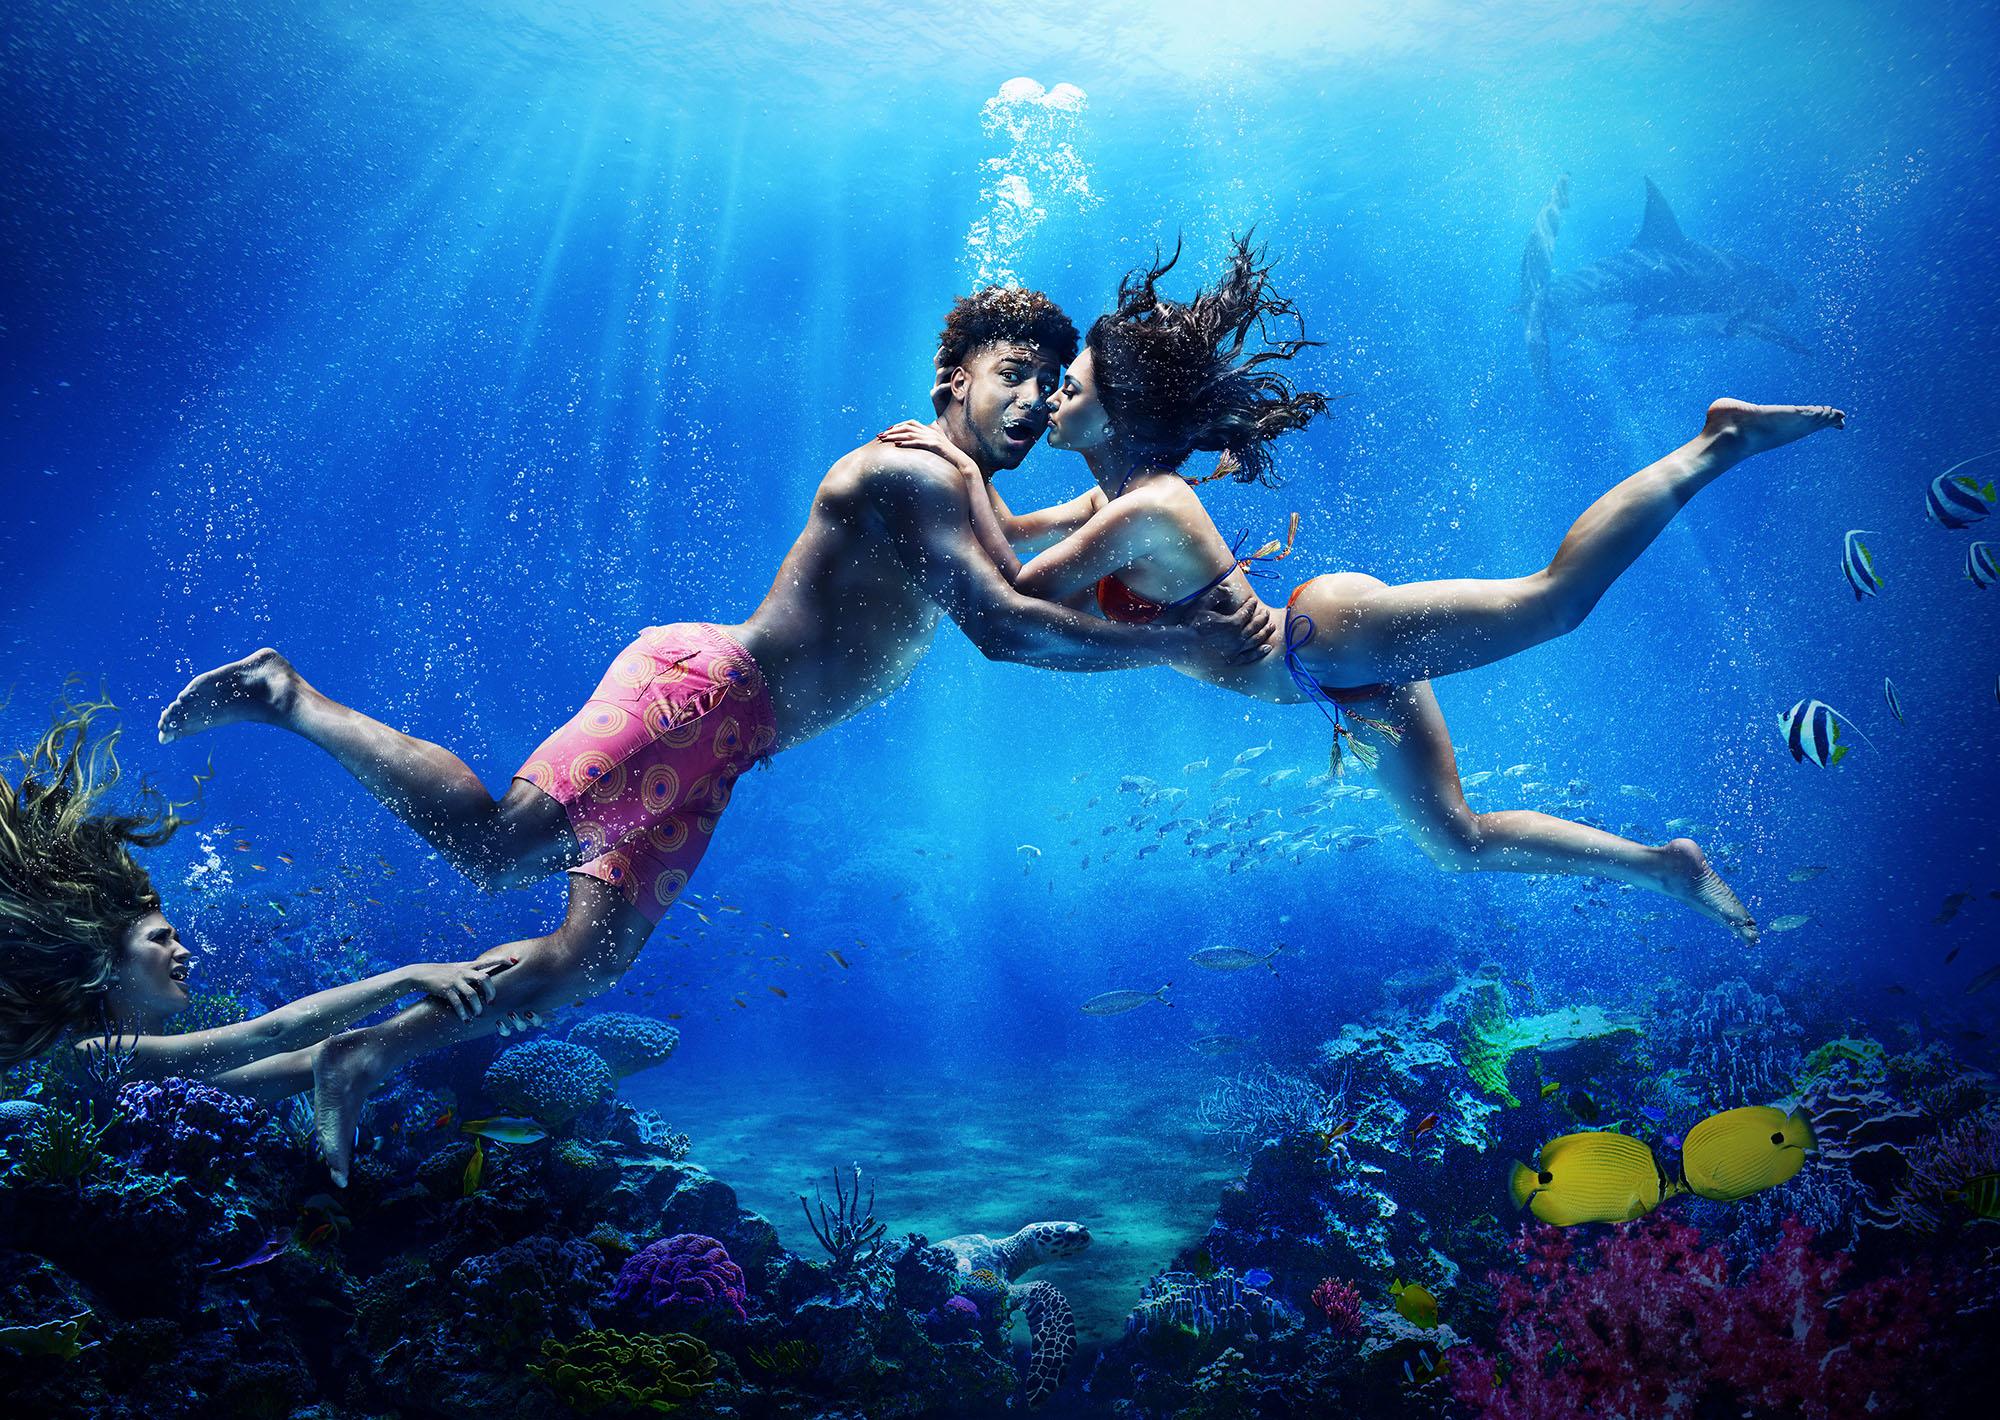 Ex On the Beach - Key Art Campaign - 'How Deep is their Love'